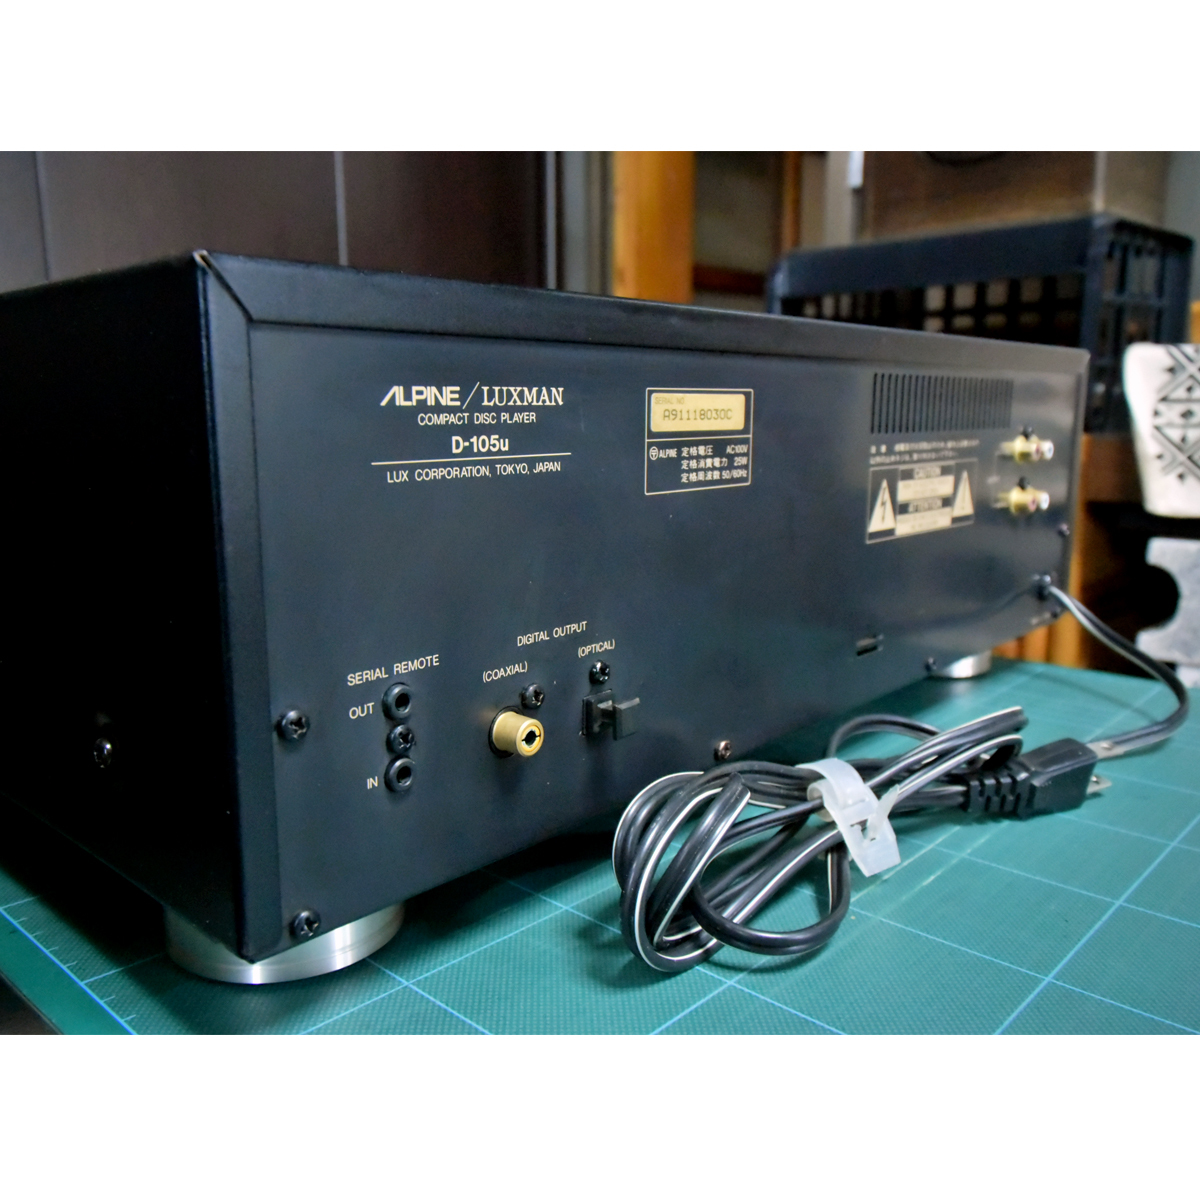 ALPINE/LUXMAN D-105u管球CDプレーヤー★ジャンク_画像5